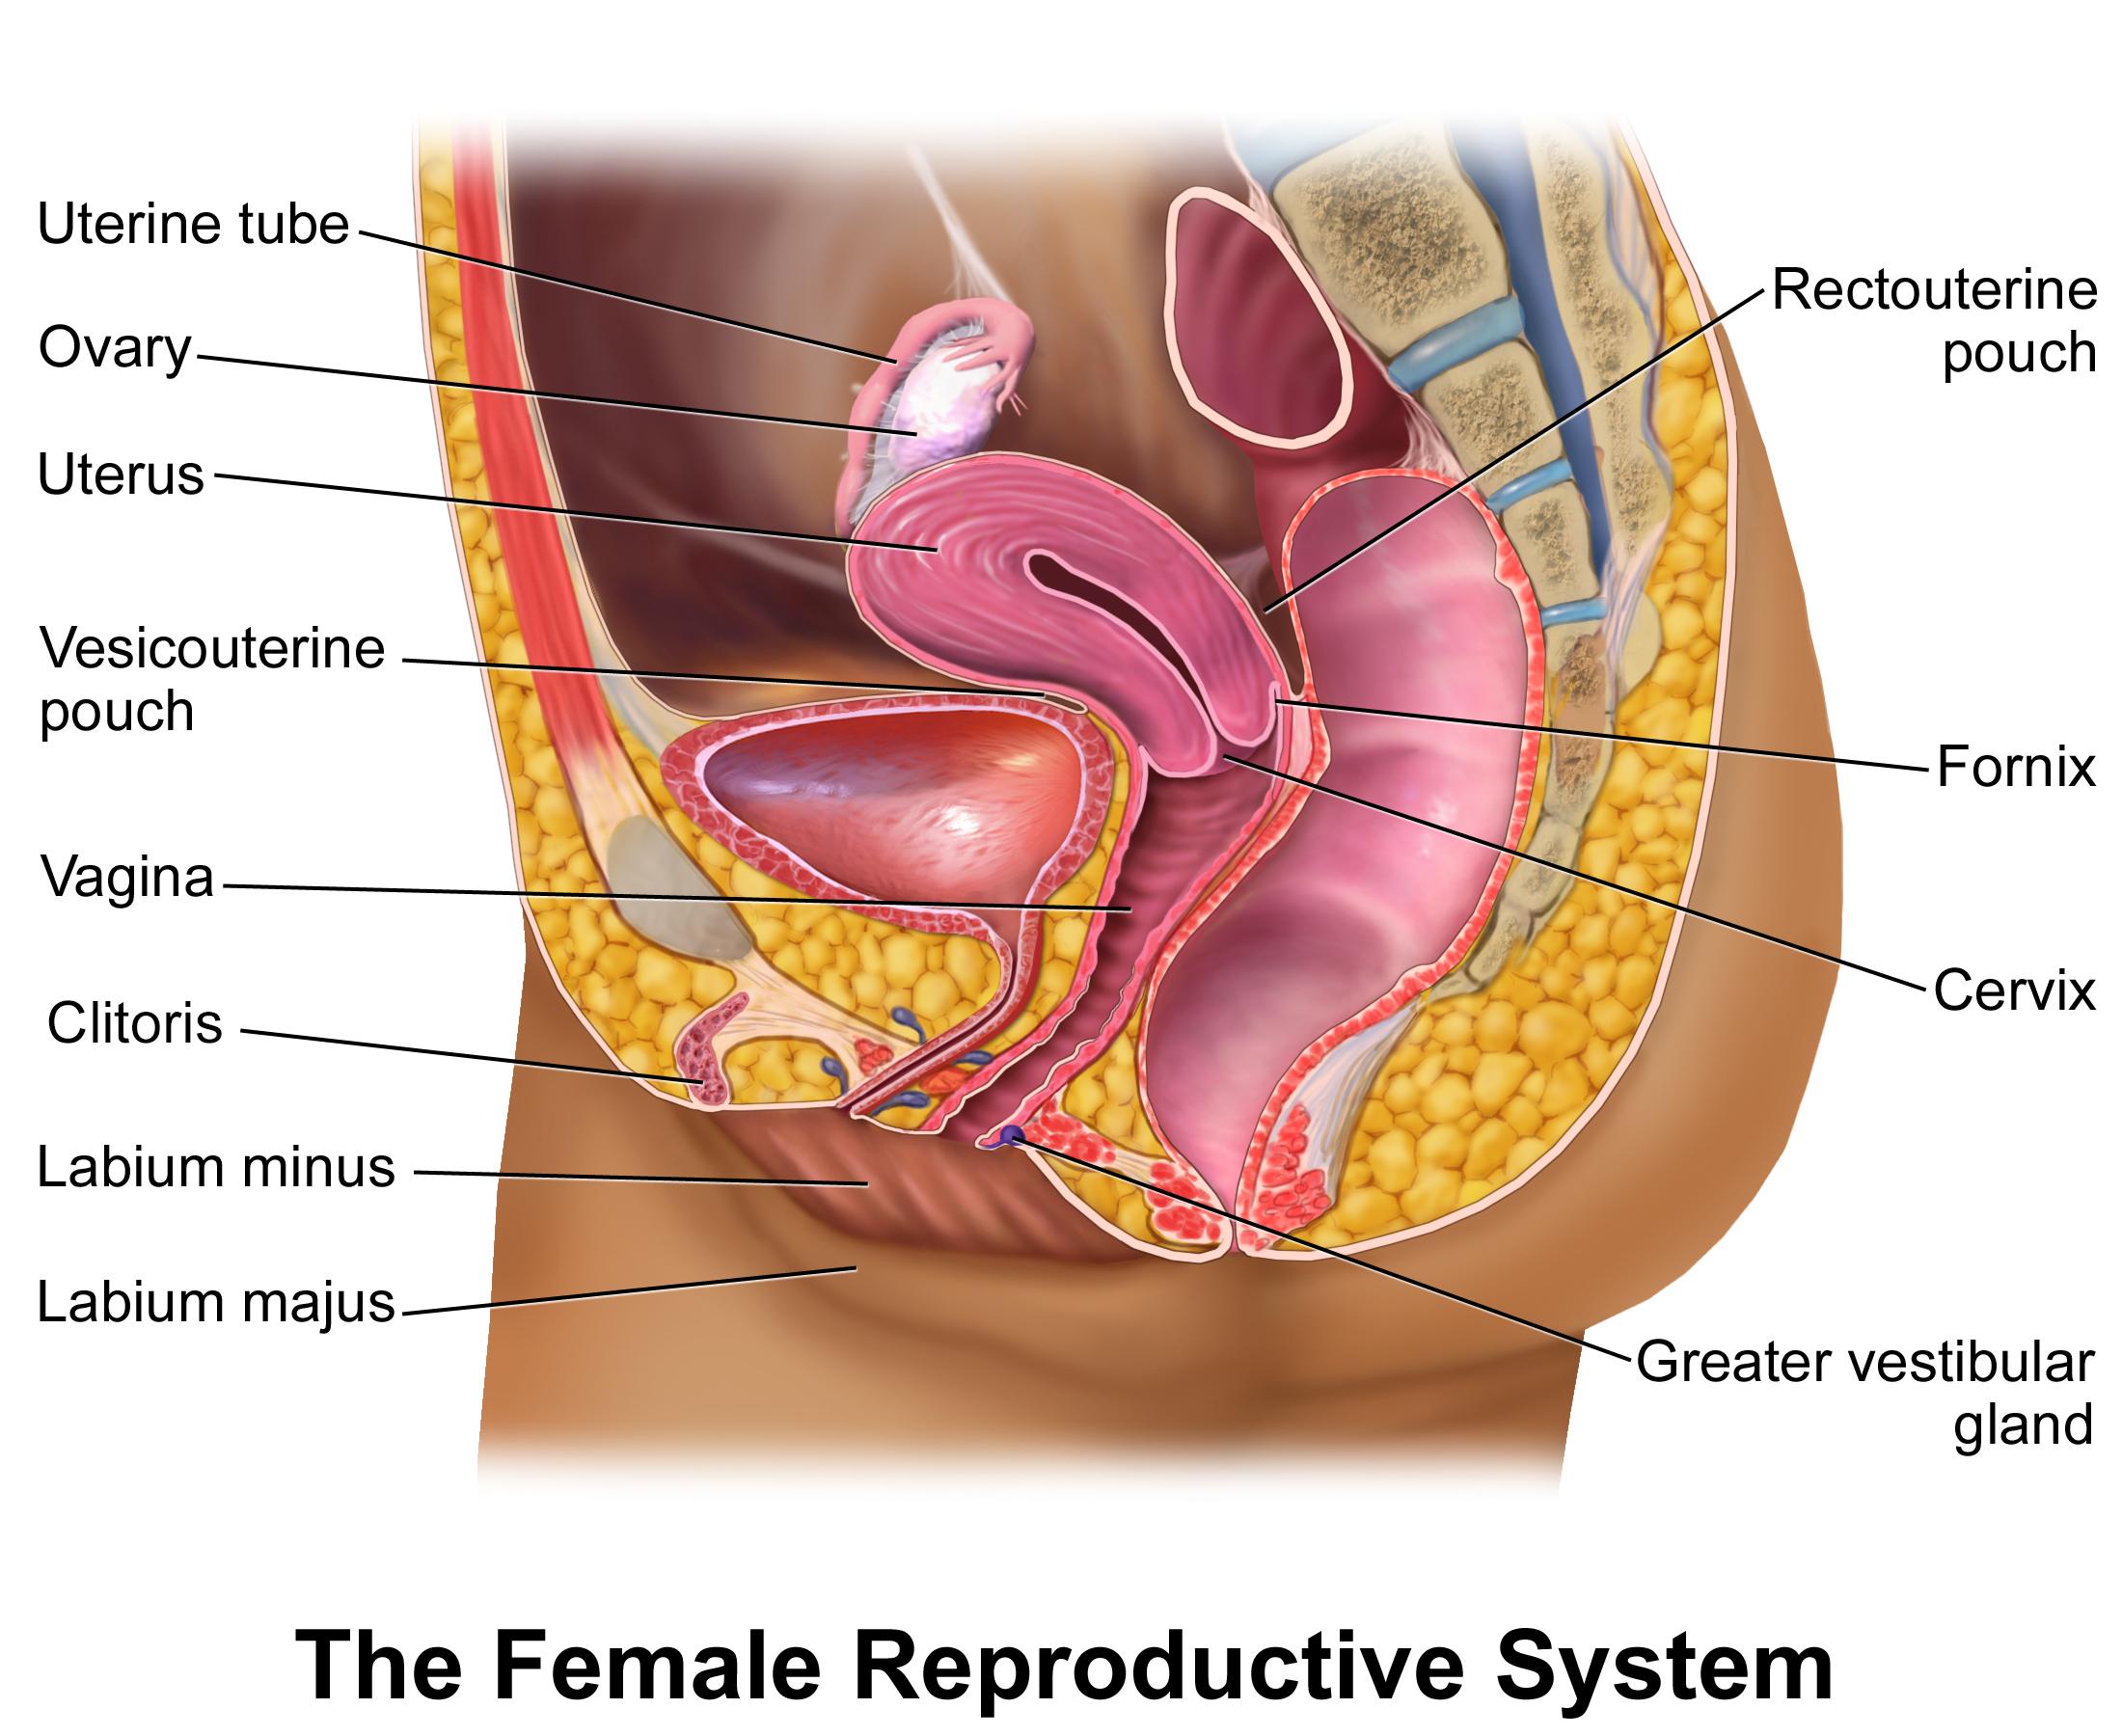 Female Reproductive System Diagram Female Reproductive System Diagram Unmasa Dalha